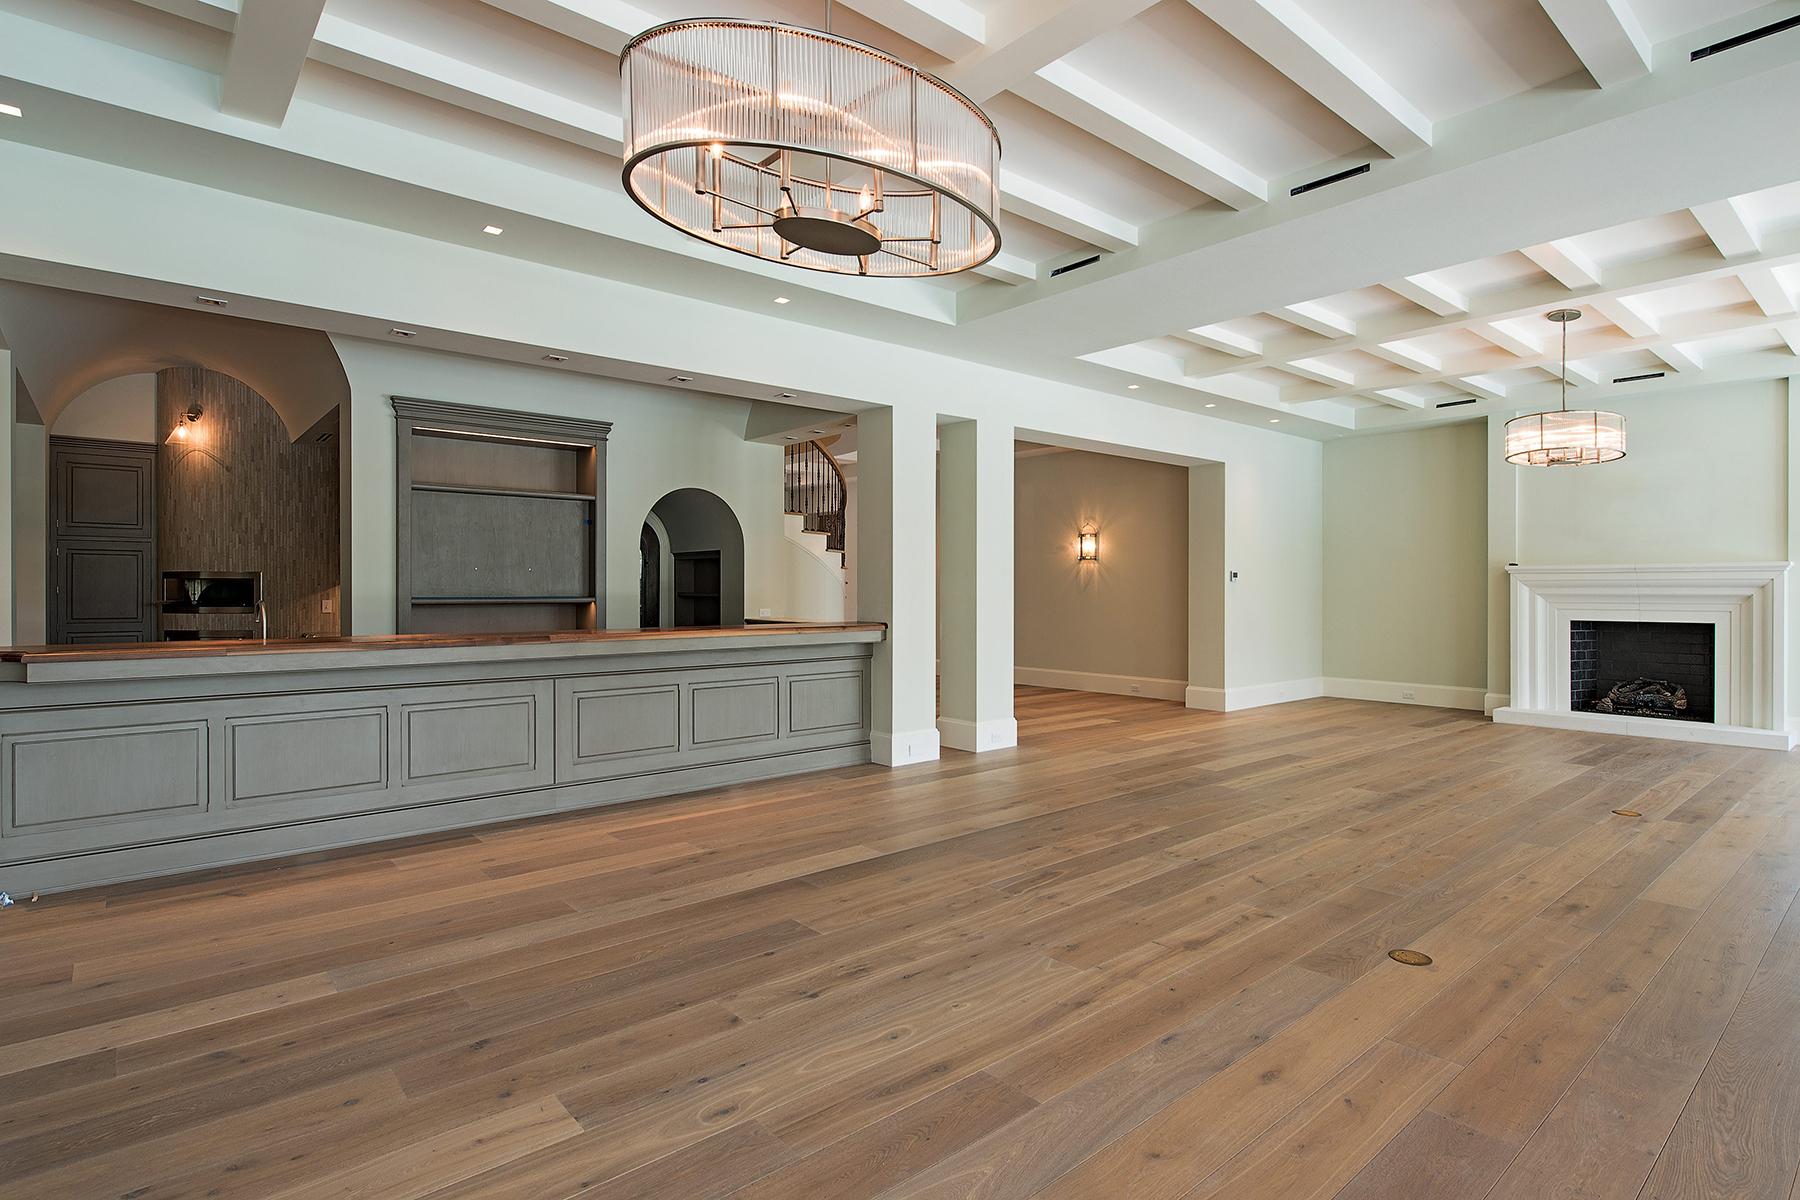 Additional photo for property listing at Naples 4233  Gordon Dr,  Naples, Florida 34102 United States